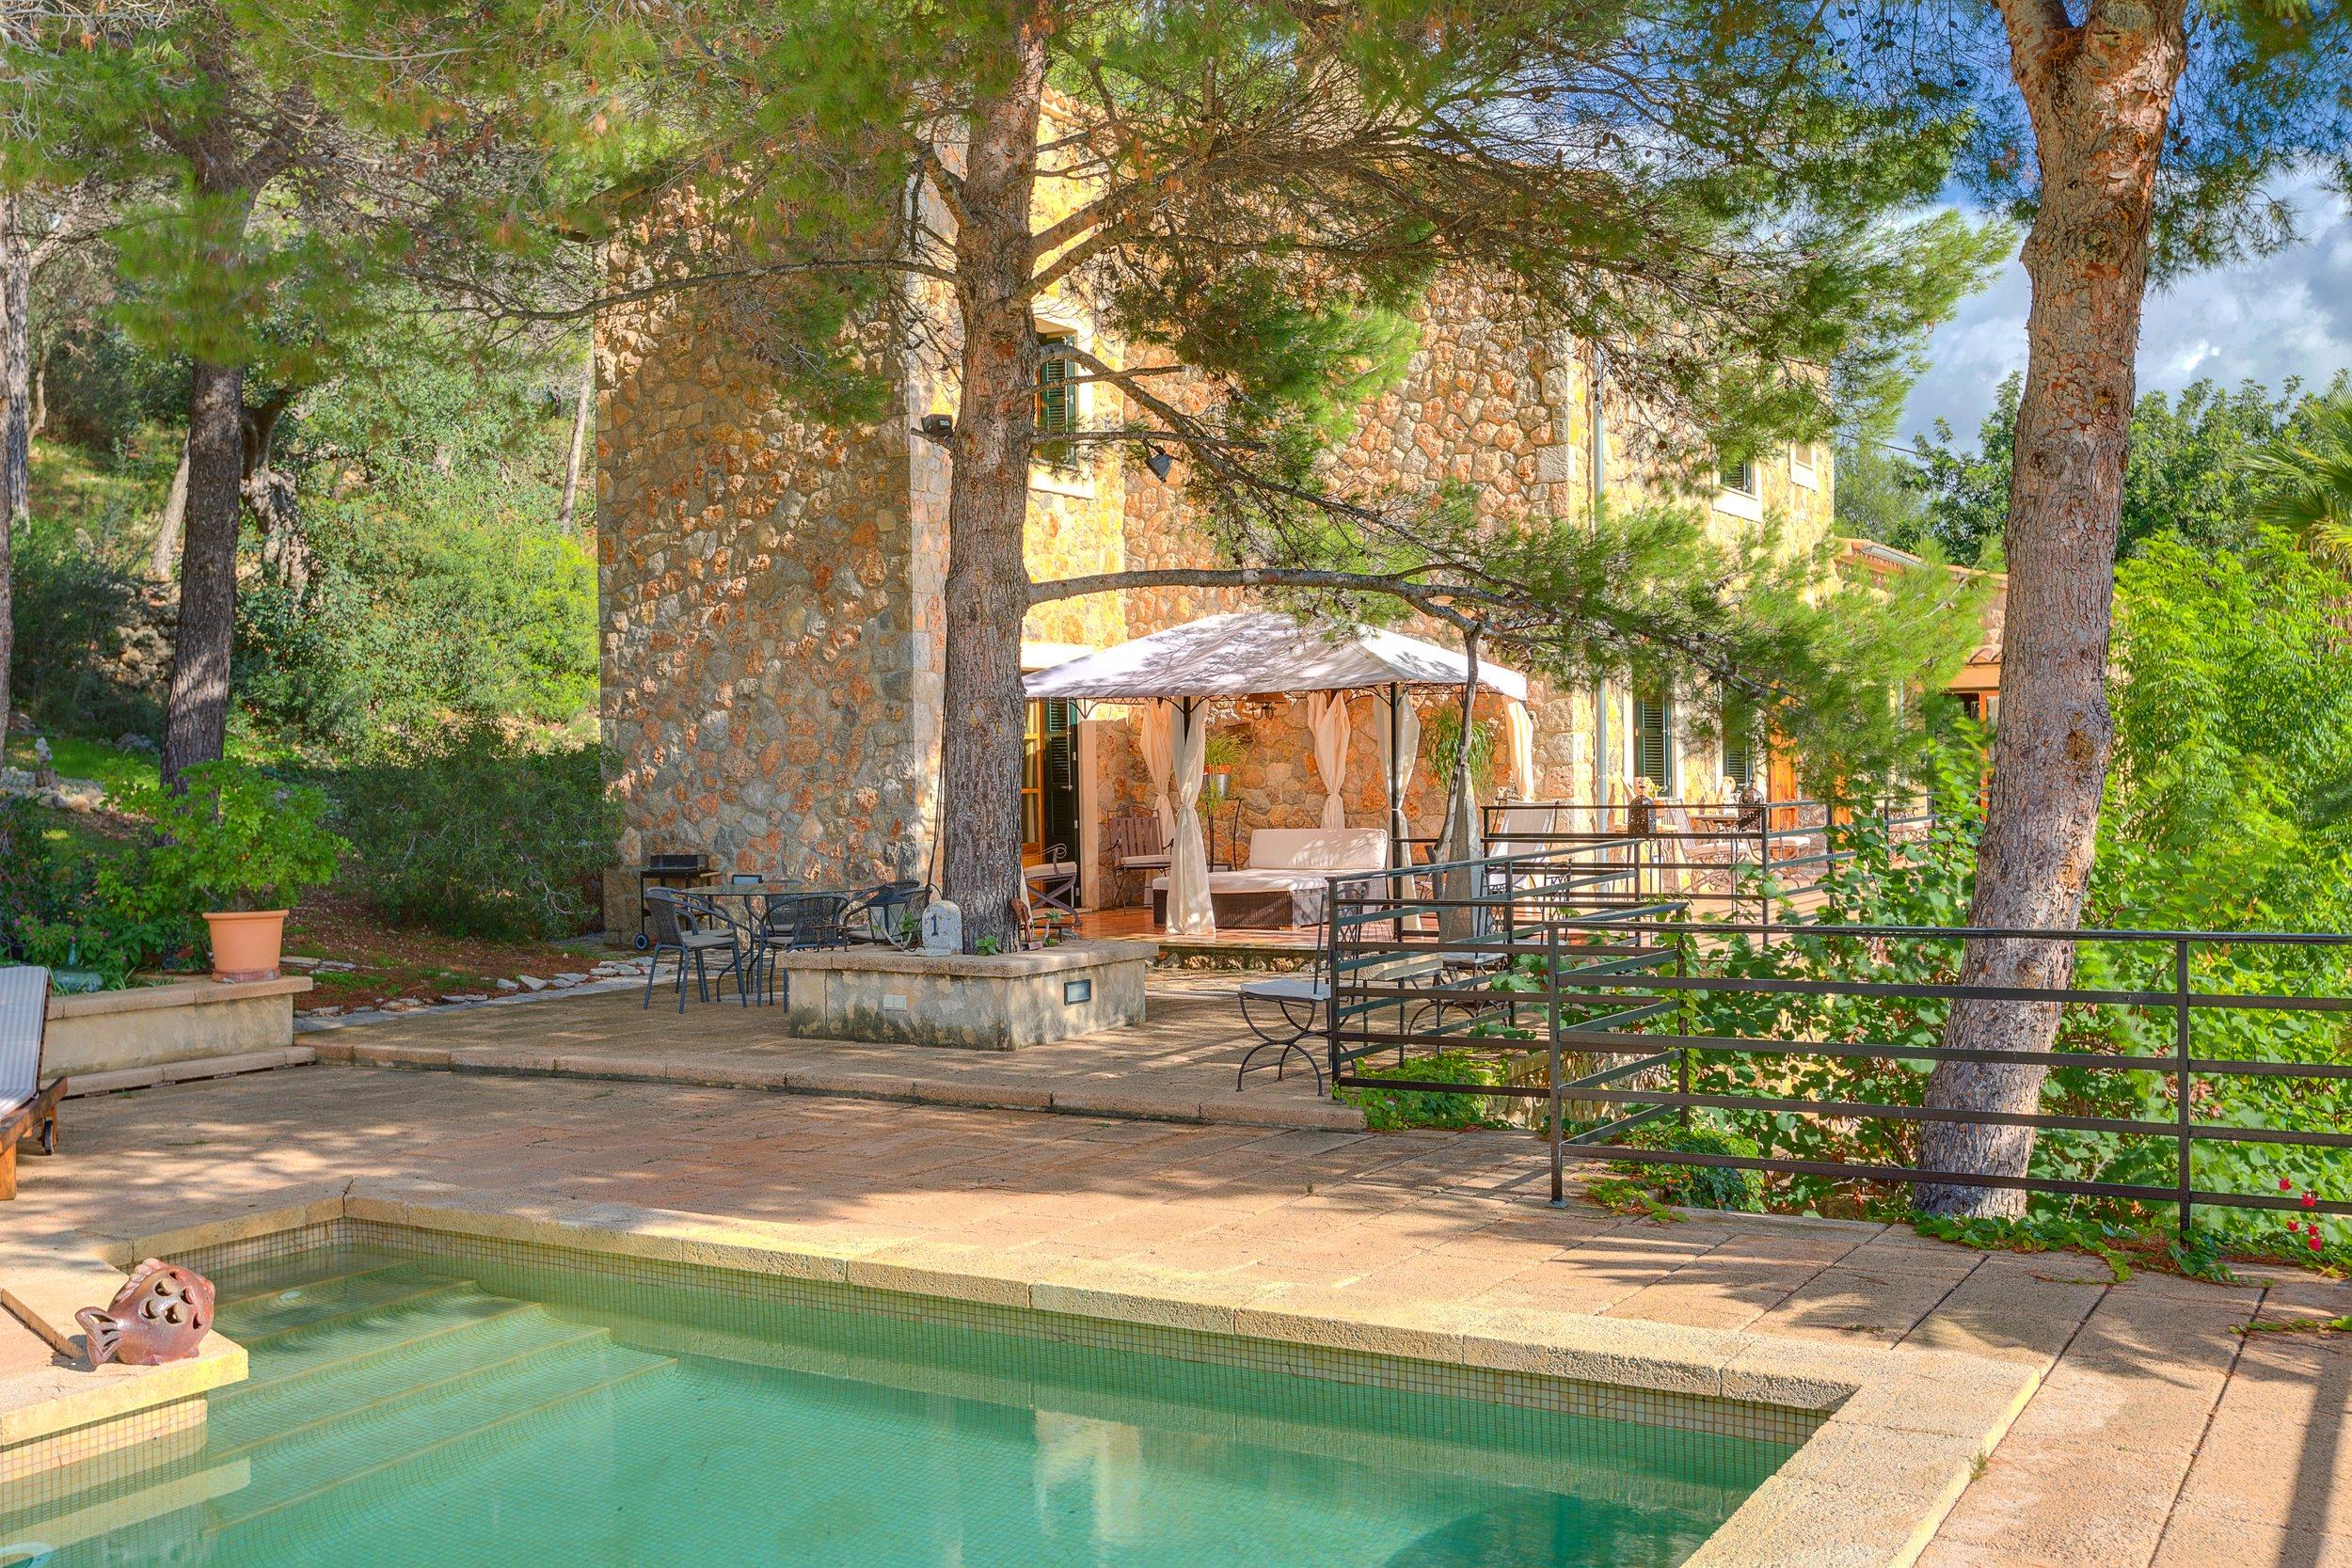 Maison de vacances Villa Cirera in Alaro (2611793), Alaro, Majorque, Iles Baléares, Espagne, image 5